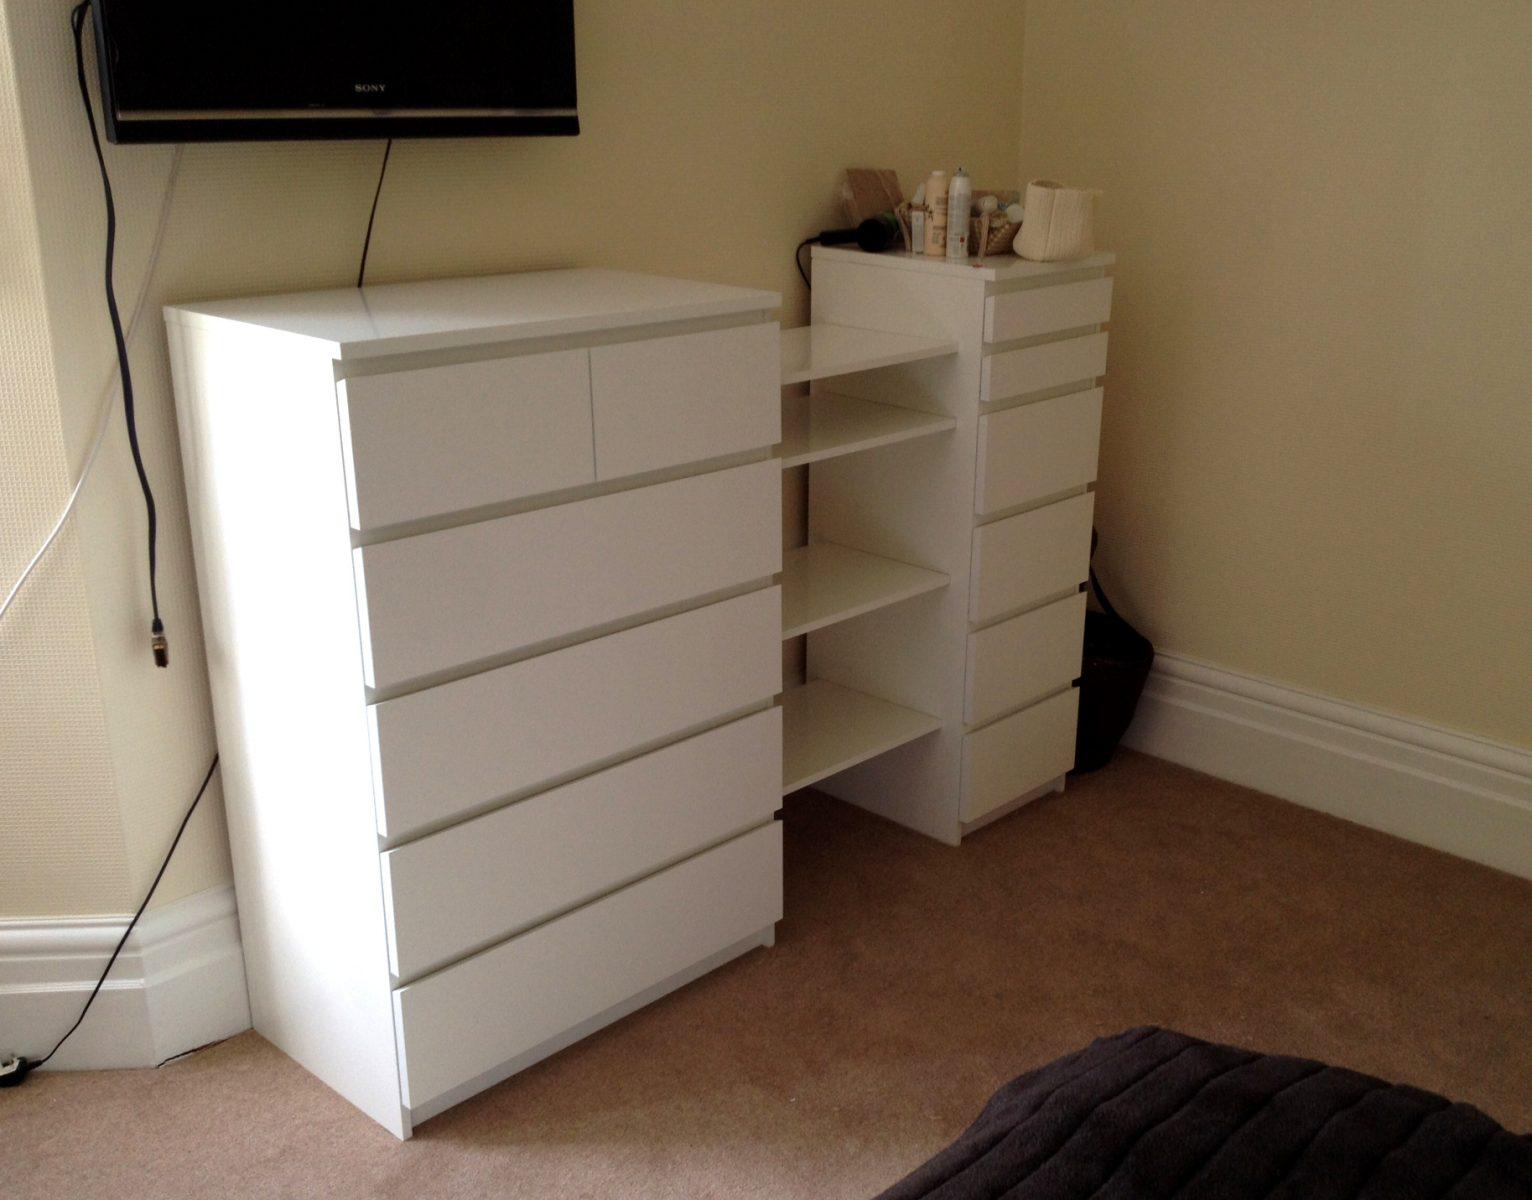 IKEA Malm drawers & Besta shelf hack by Flat Pack Dan